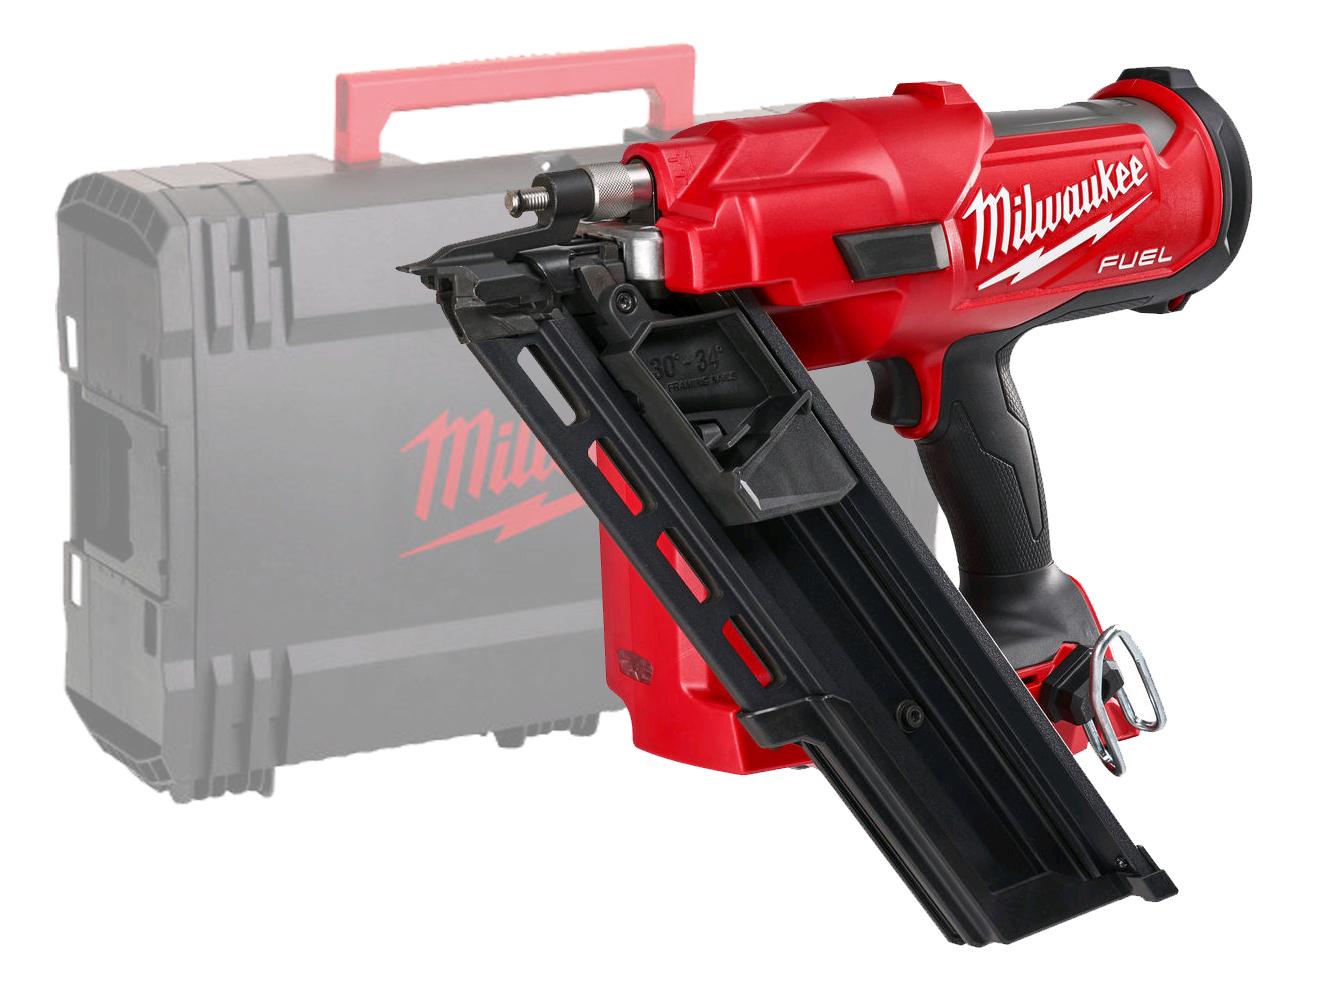 Milwaukee M18FFN 18V Fuel Framing Nailer (1St Fix Nail Gun) Gasless - Body Only